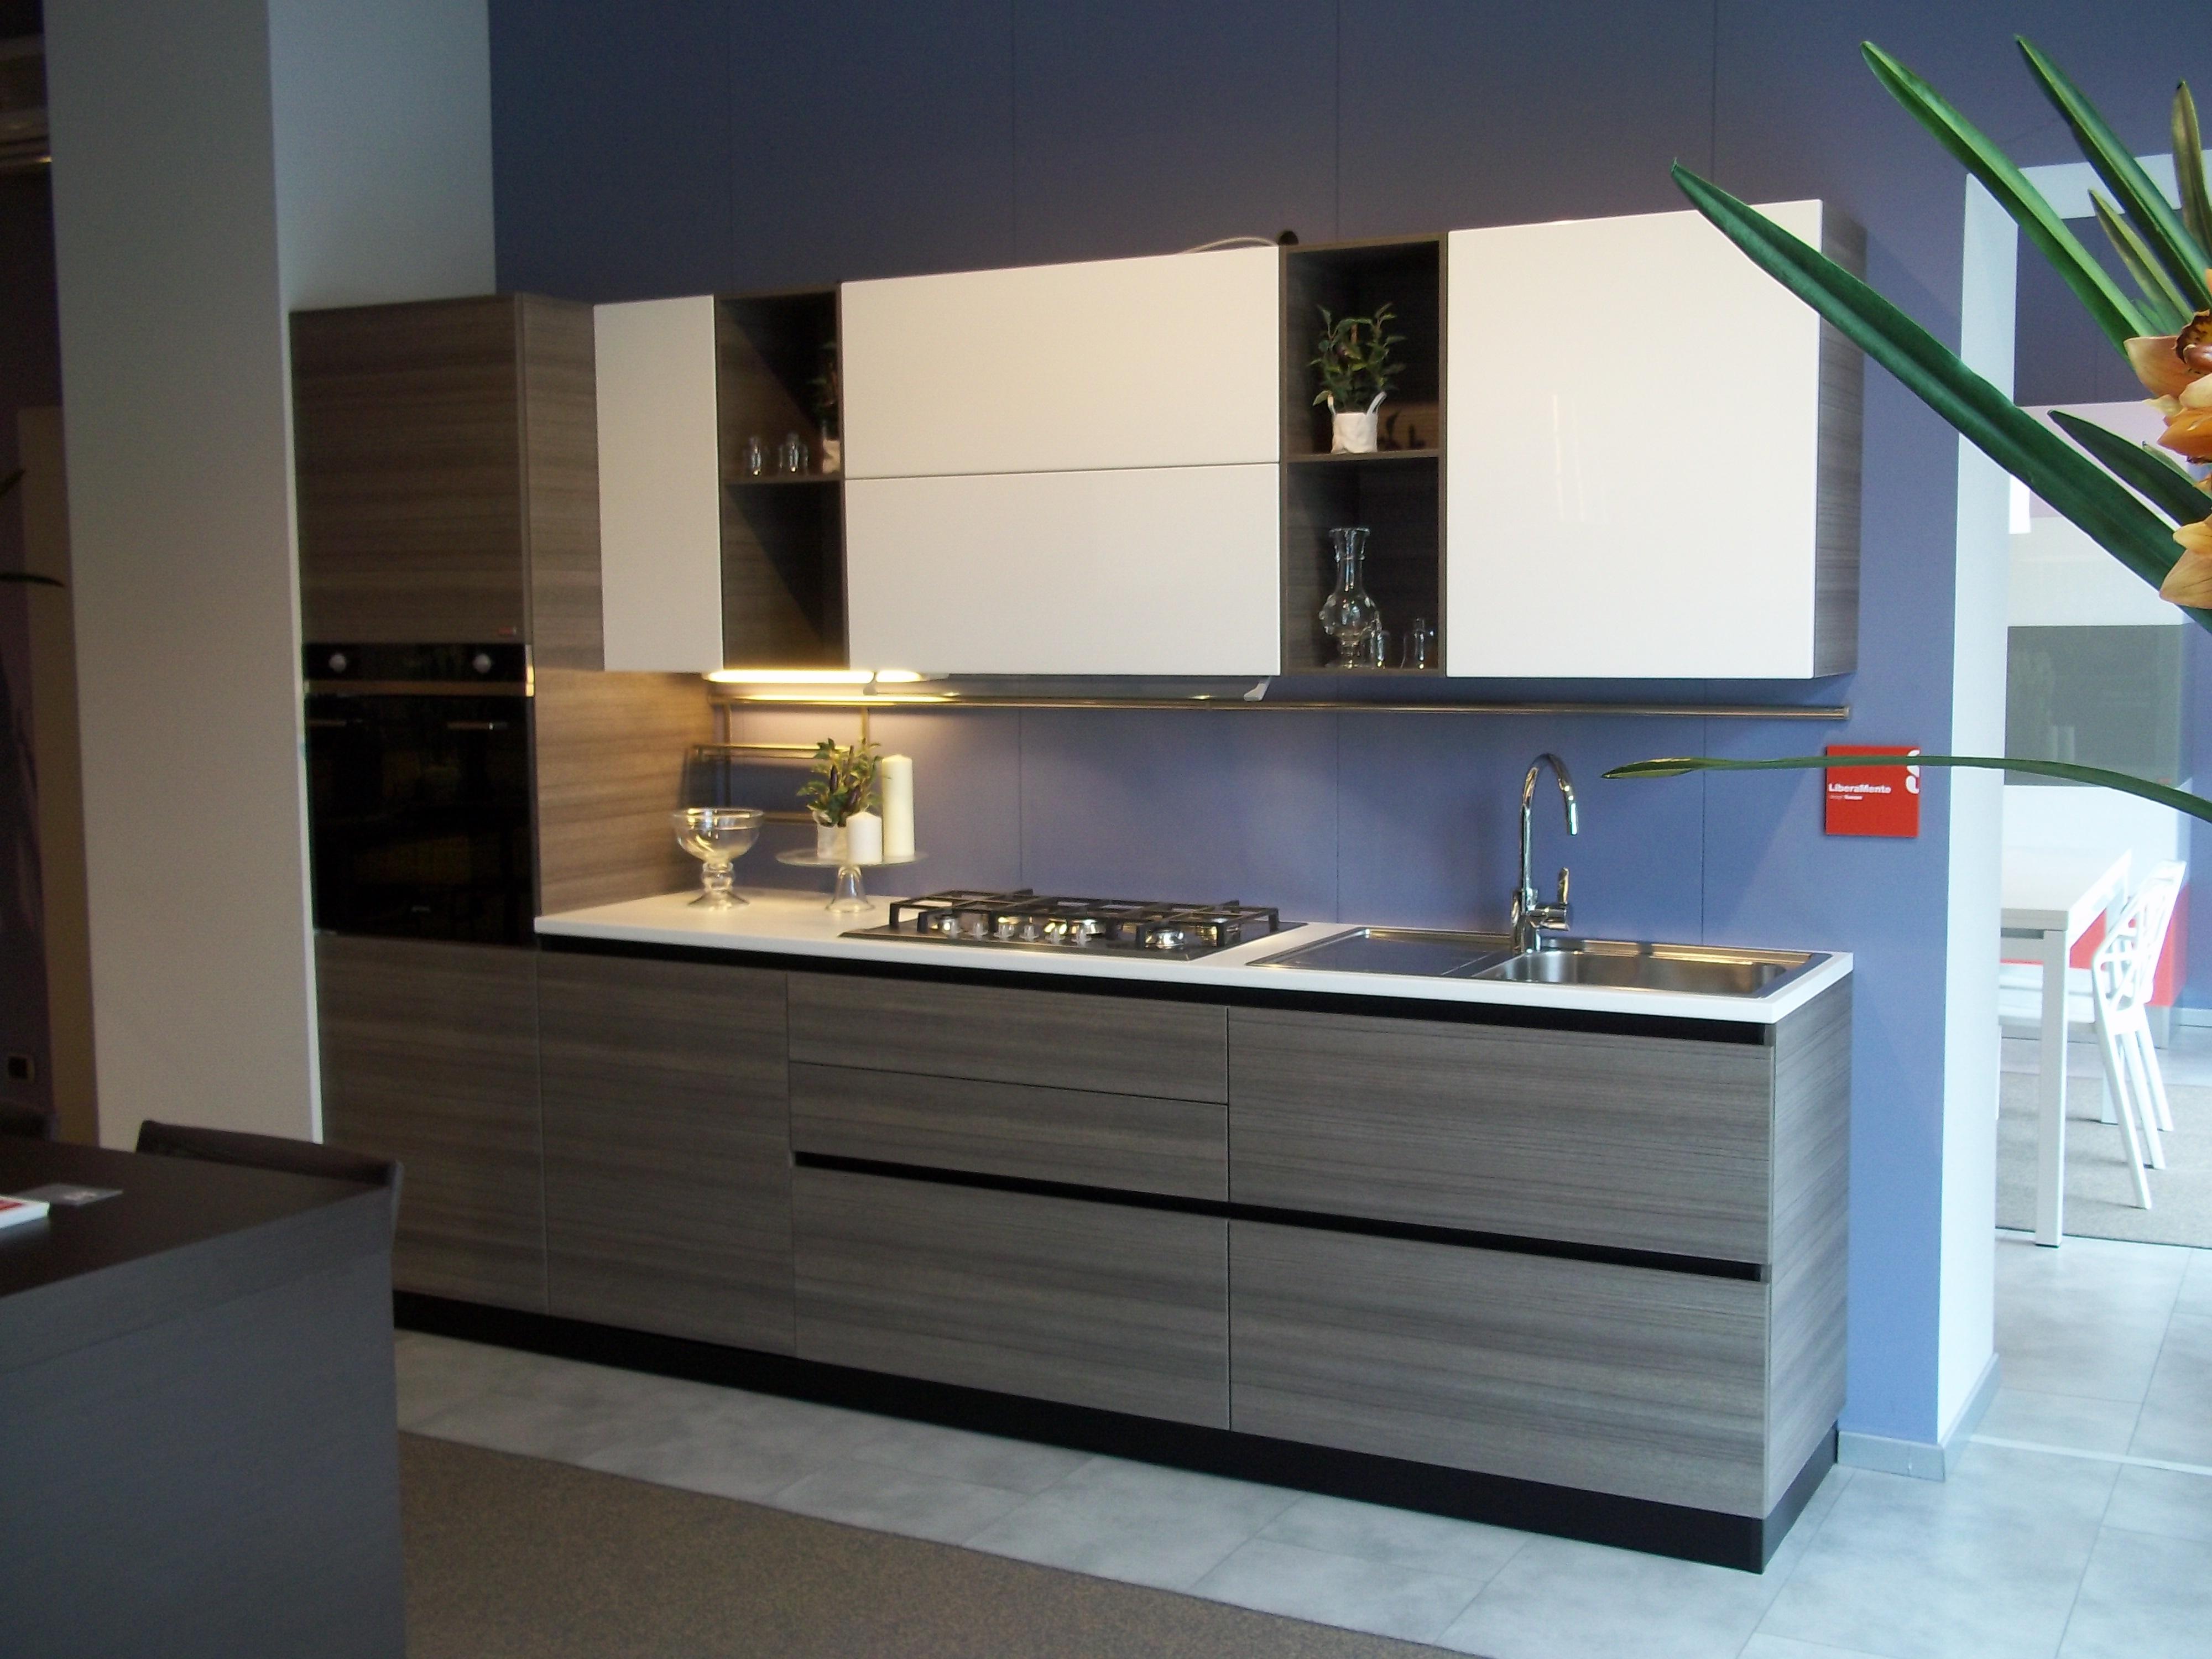 offerta scavolini liberamente 16503 - cucine a prezzi scontati - Cucine Bianche E Grigie Scavolini